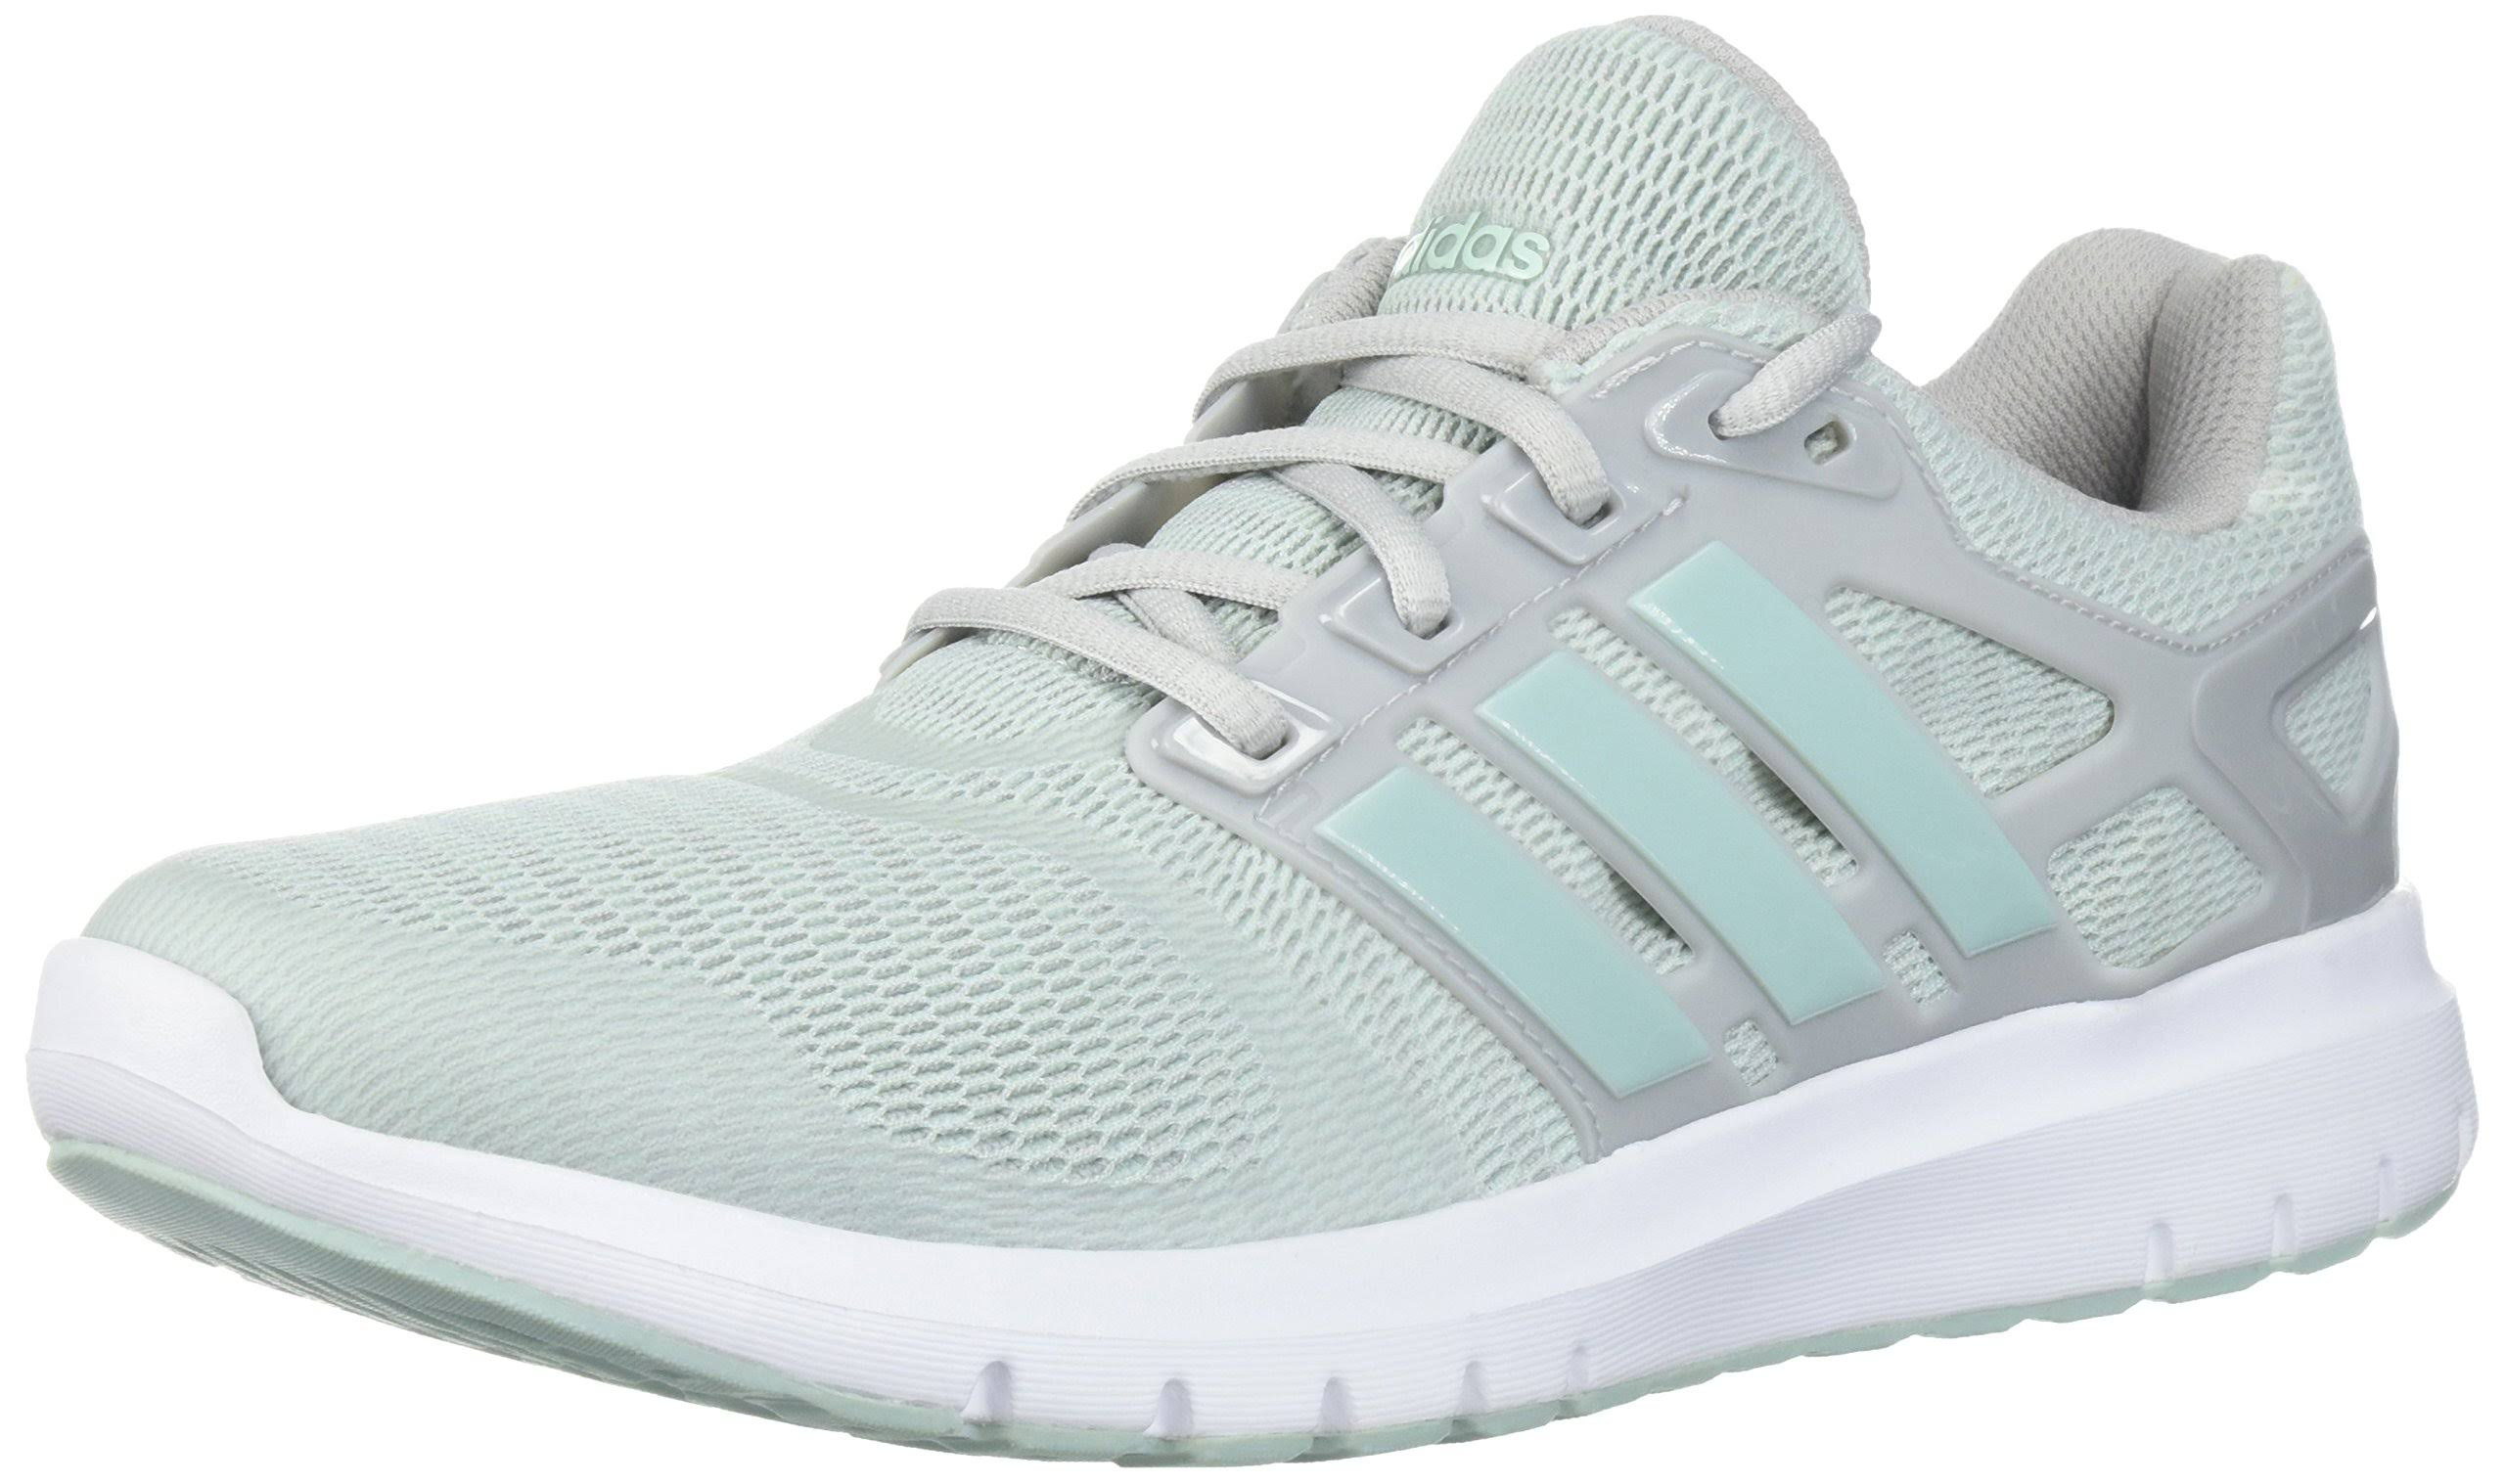 Verde De Energy Mediano Ceniza Running Zapatillas Gris Para Tamaño Adidas Cloud Mujer 7 PFdfw